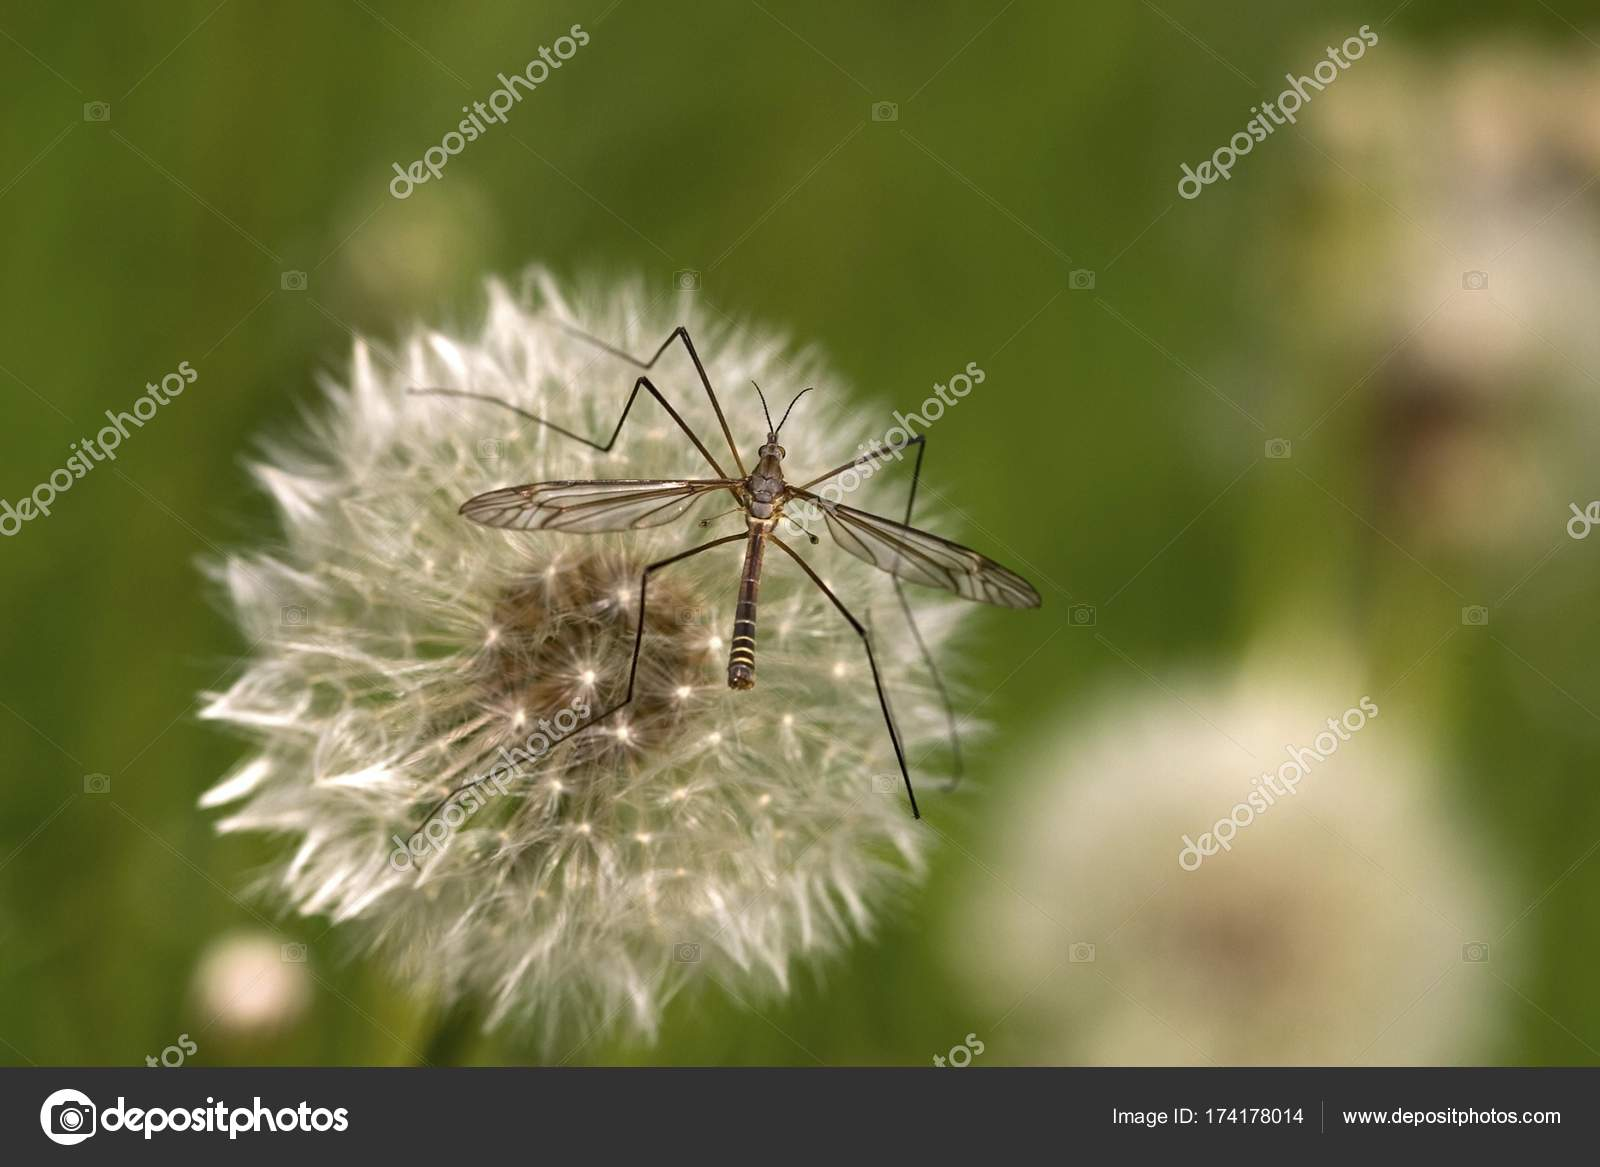 crane fly sitting on blow ball stock photo imagebrokermicrostock